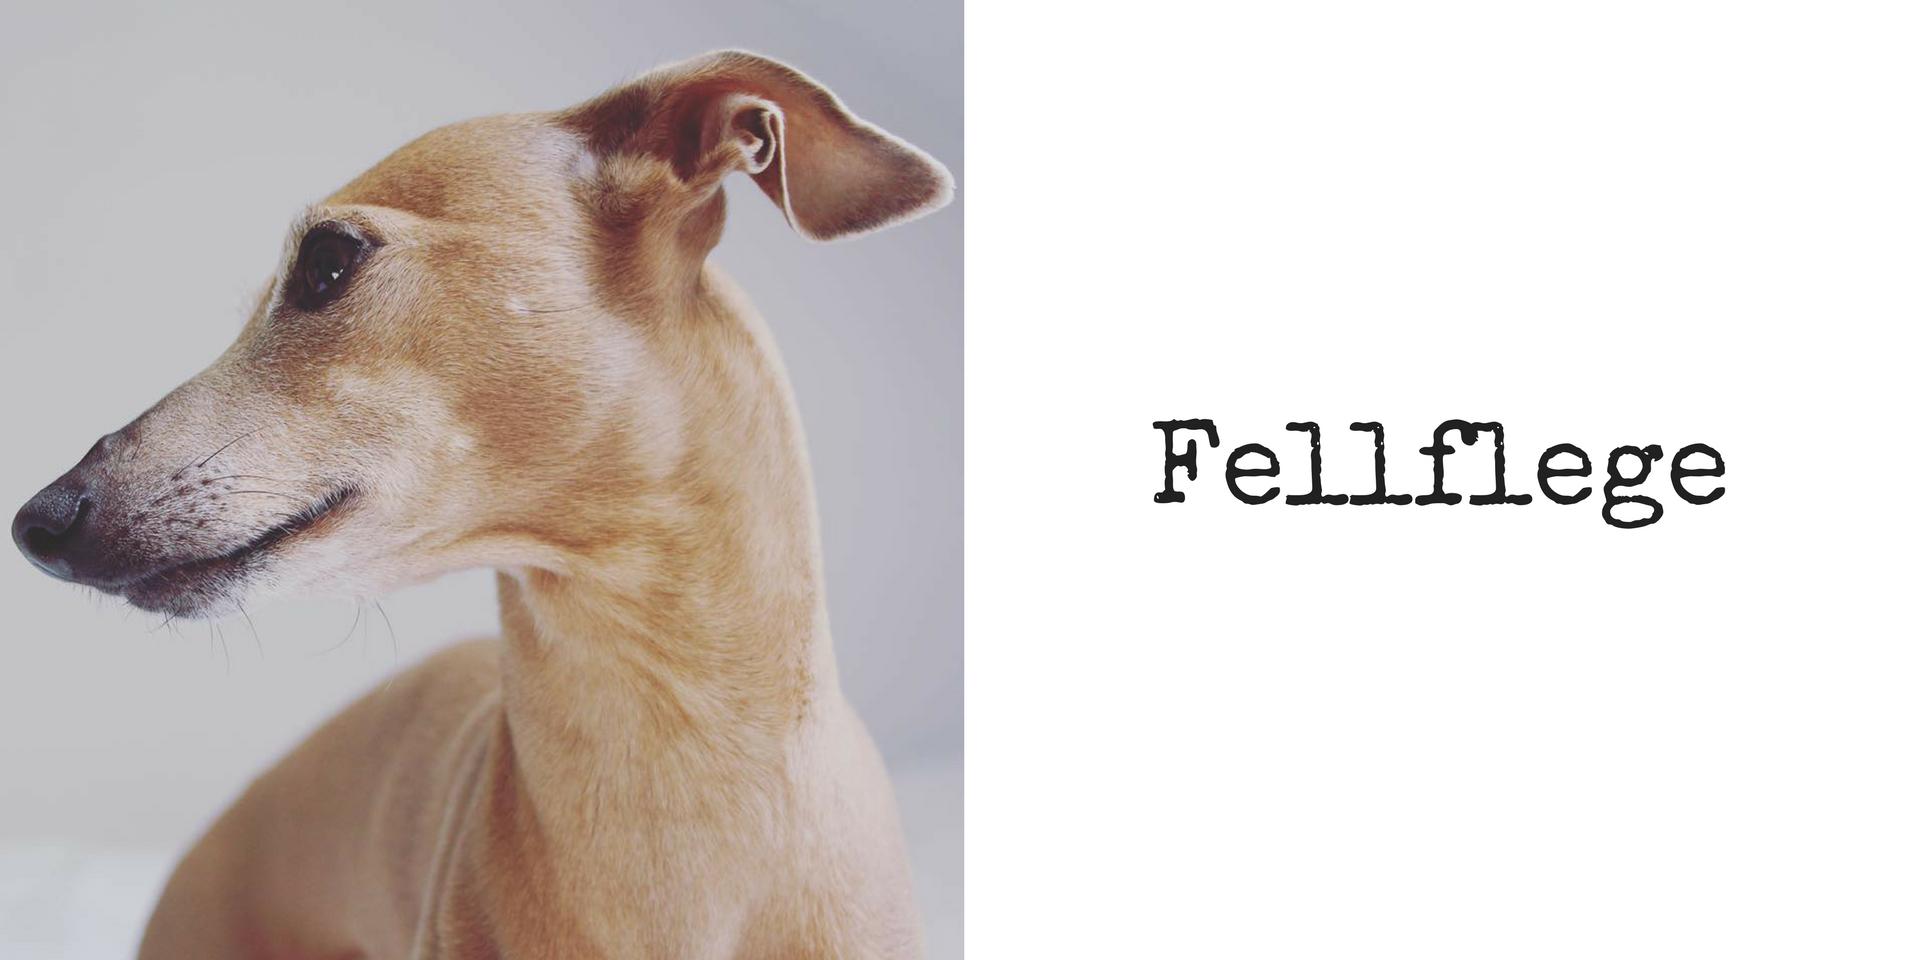 miDoggy Blog Community für Hunde Fellpflege Pflege